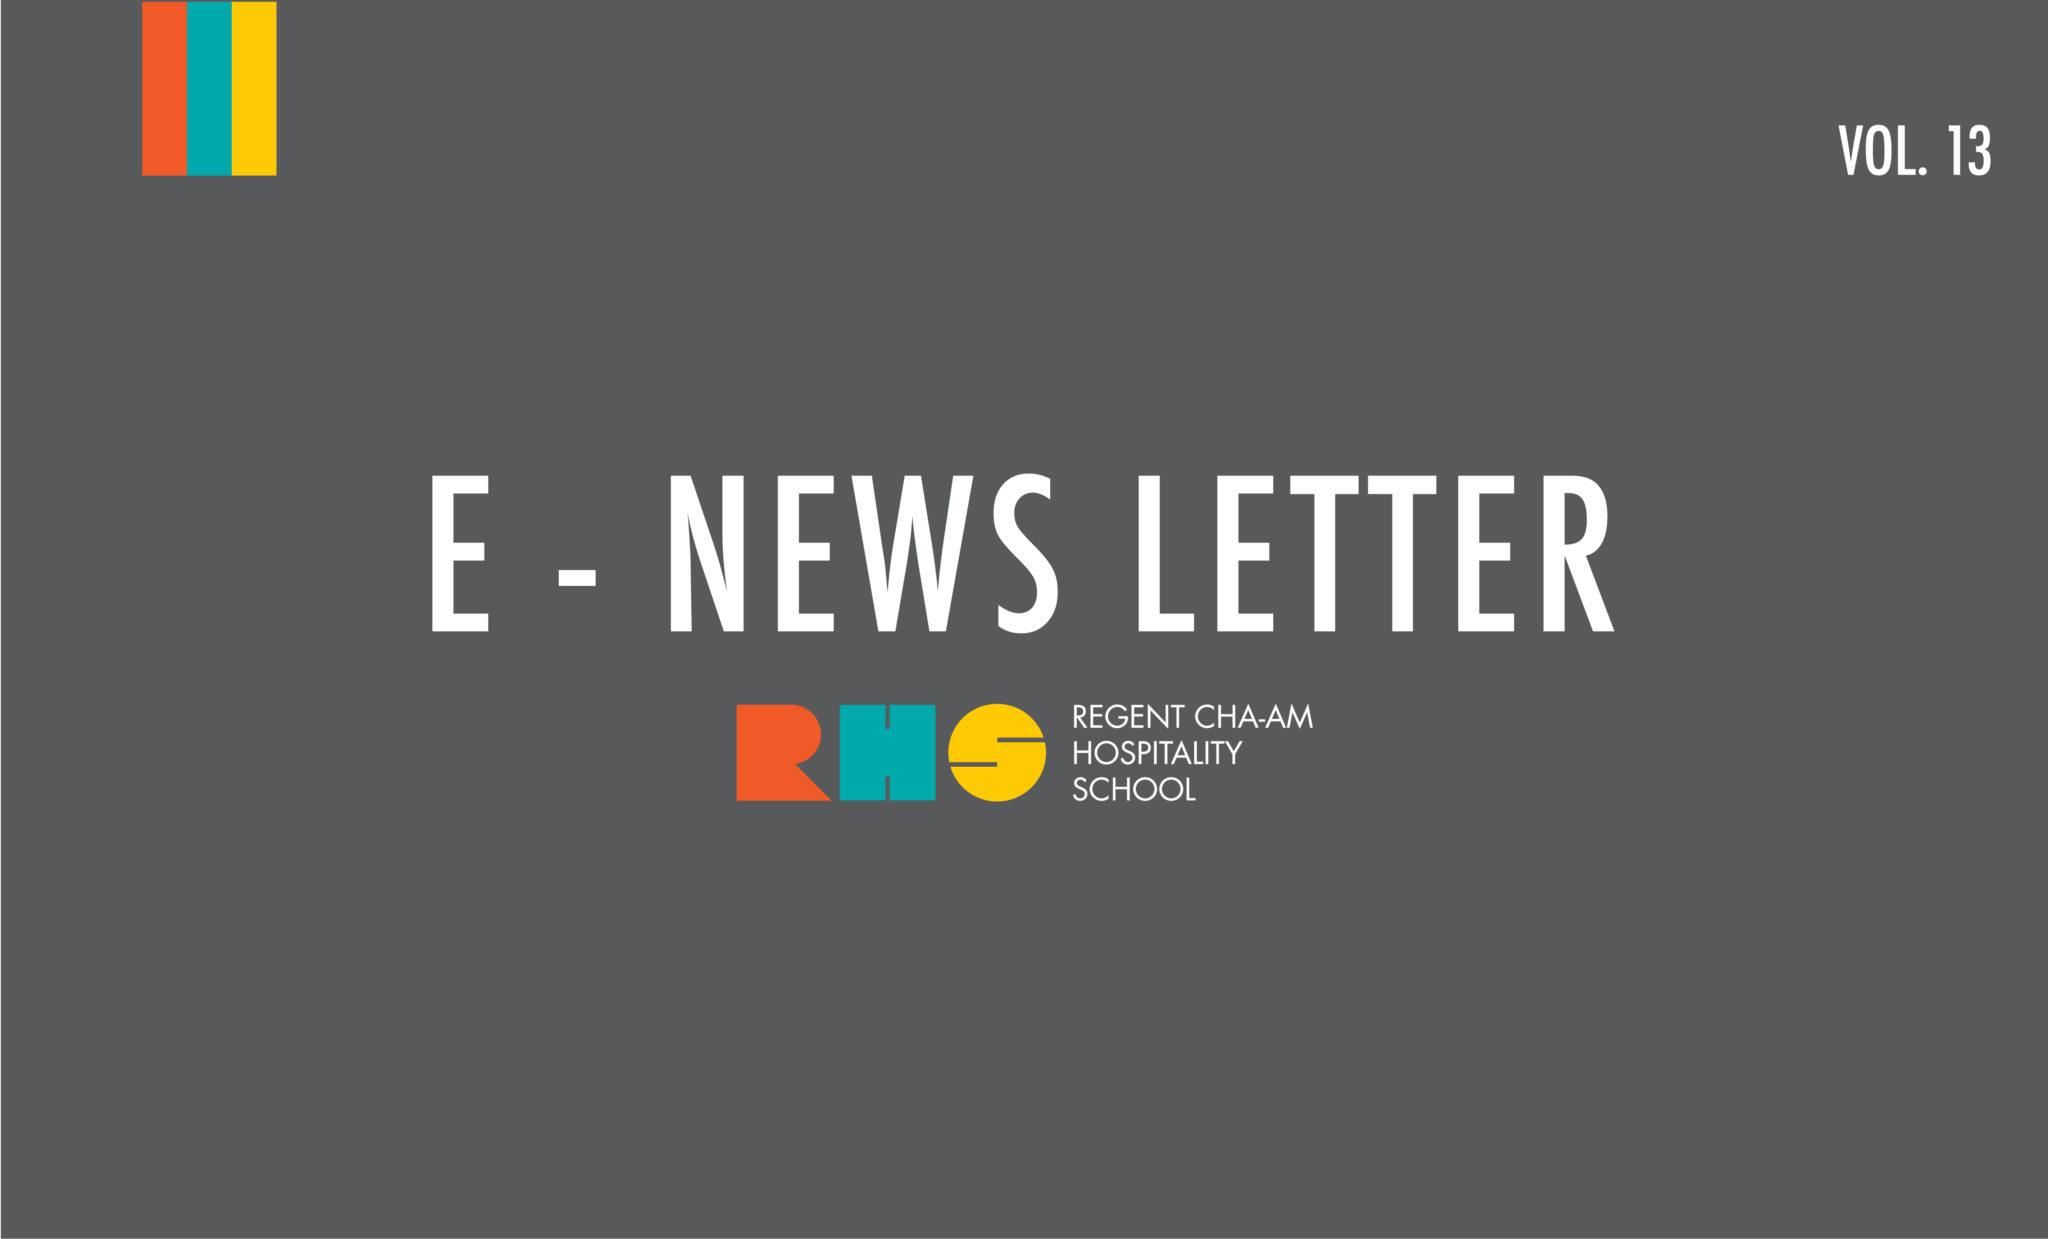 RHS E-News Letter Vol.13